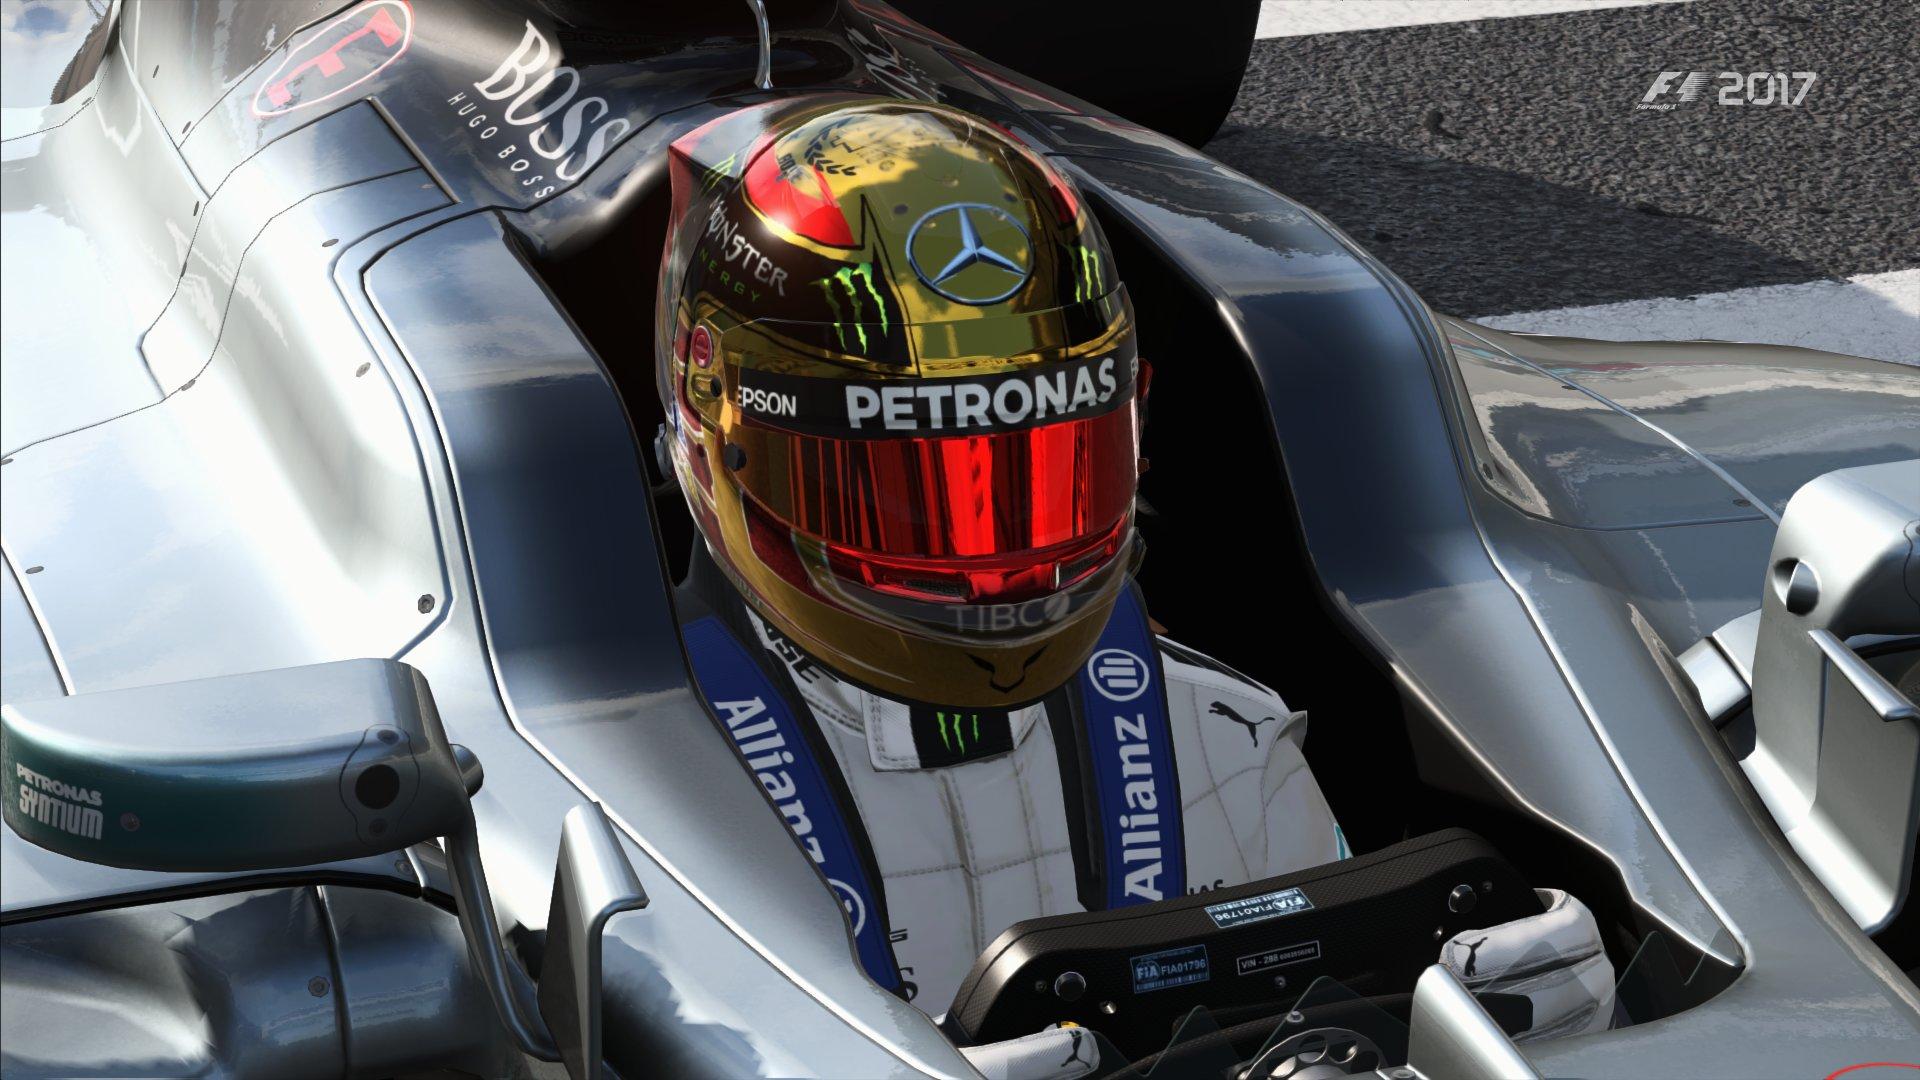 F1_2017_photo_20171228_110219.jpg